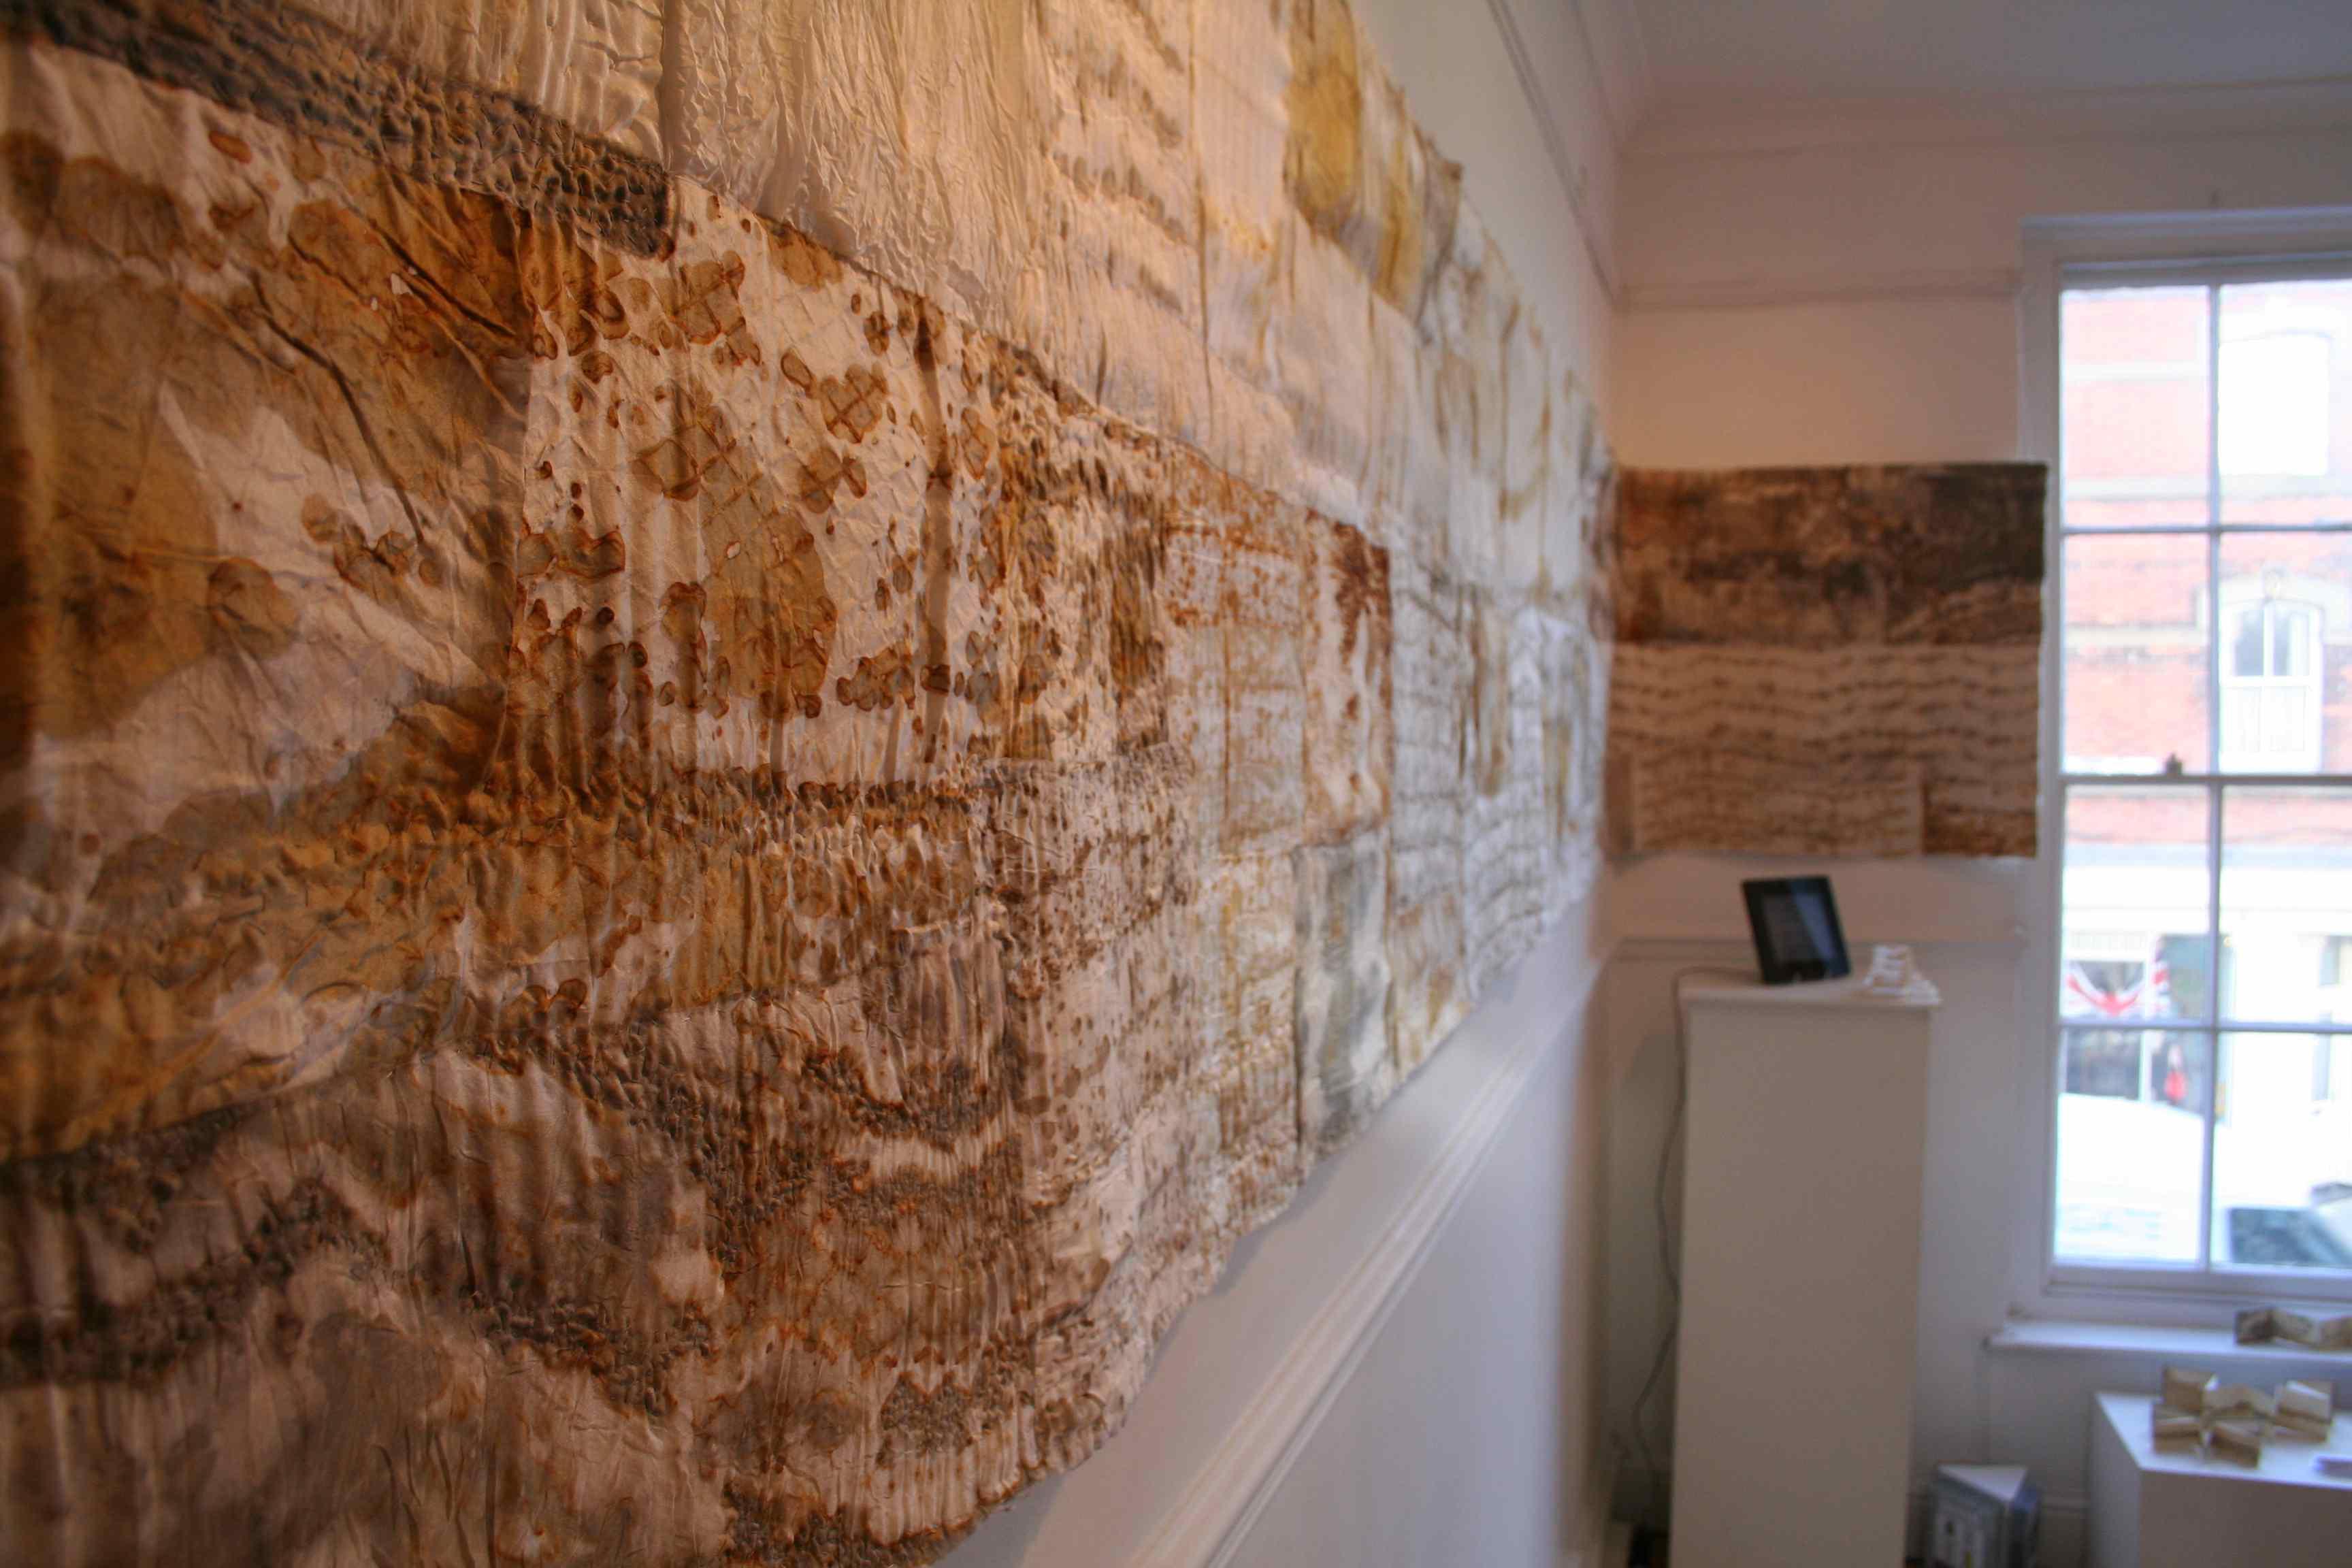 Alice Fox Spurn Cloth #1 at Gallery 49 exhibition